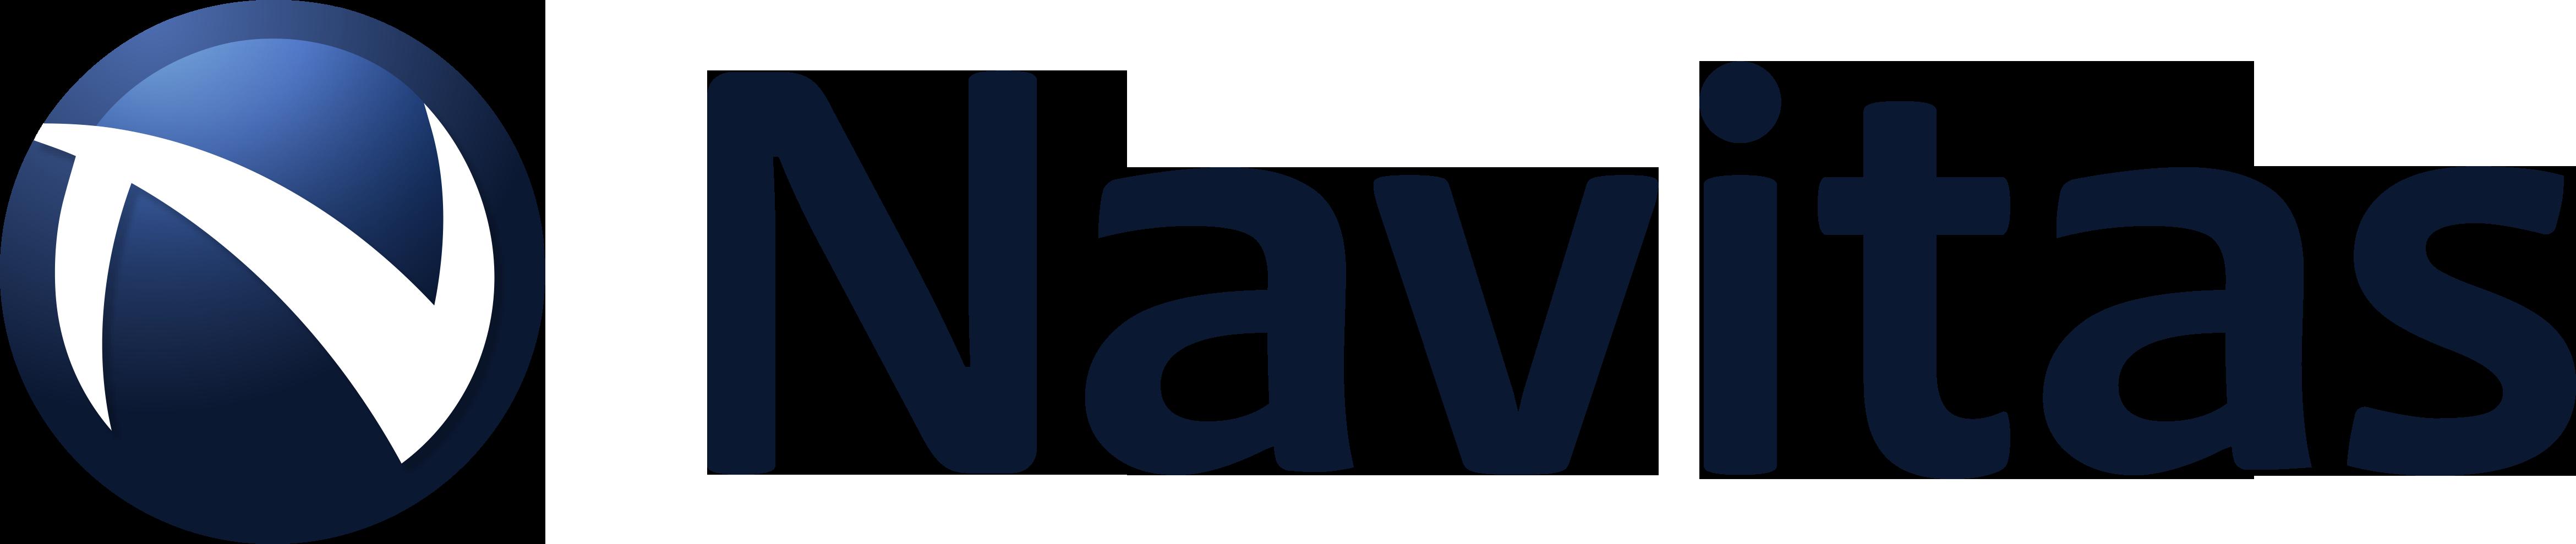 Navitas GaN Power ICs Drive Revolutionary Performance at Inaugural Power Electronics Conference 2017